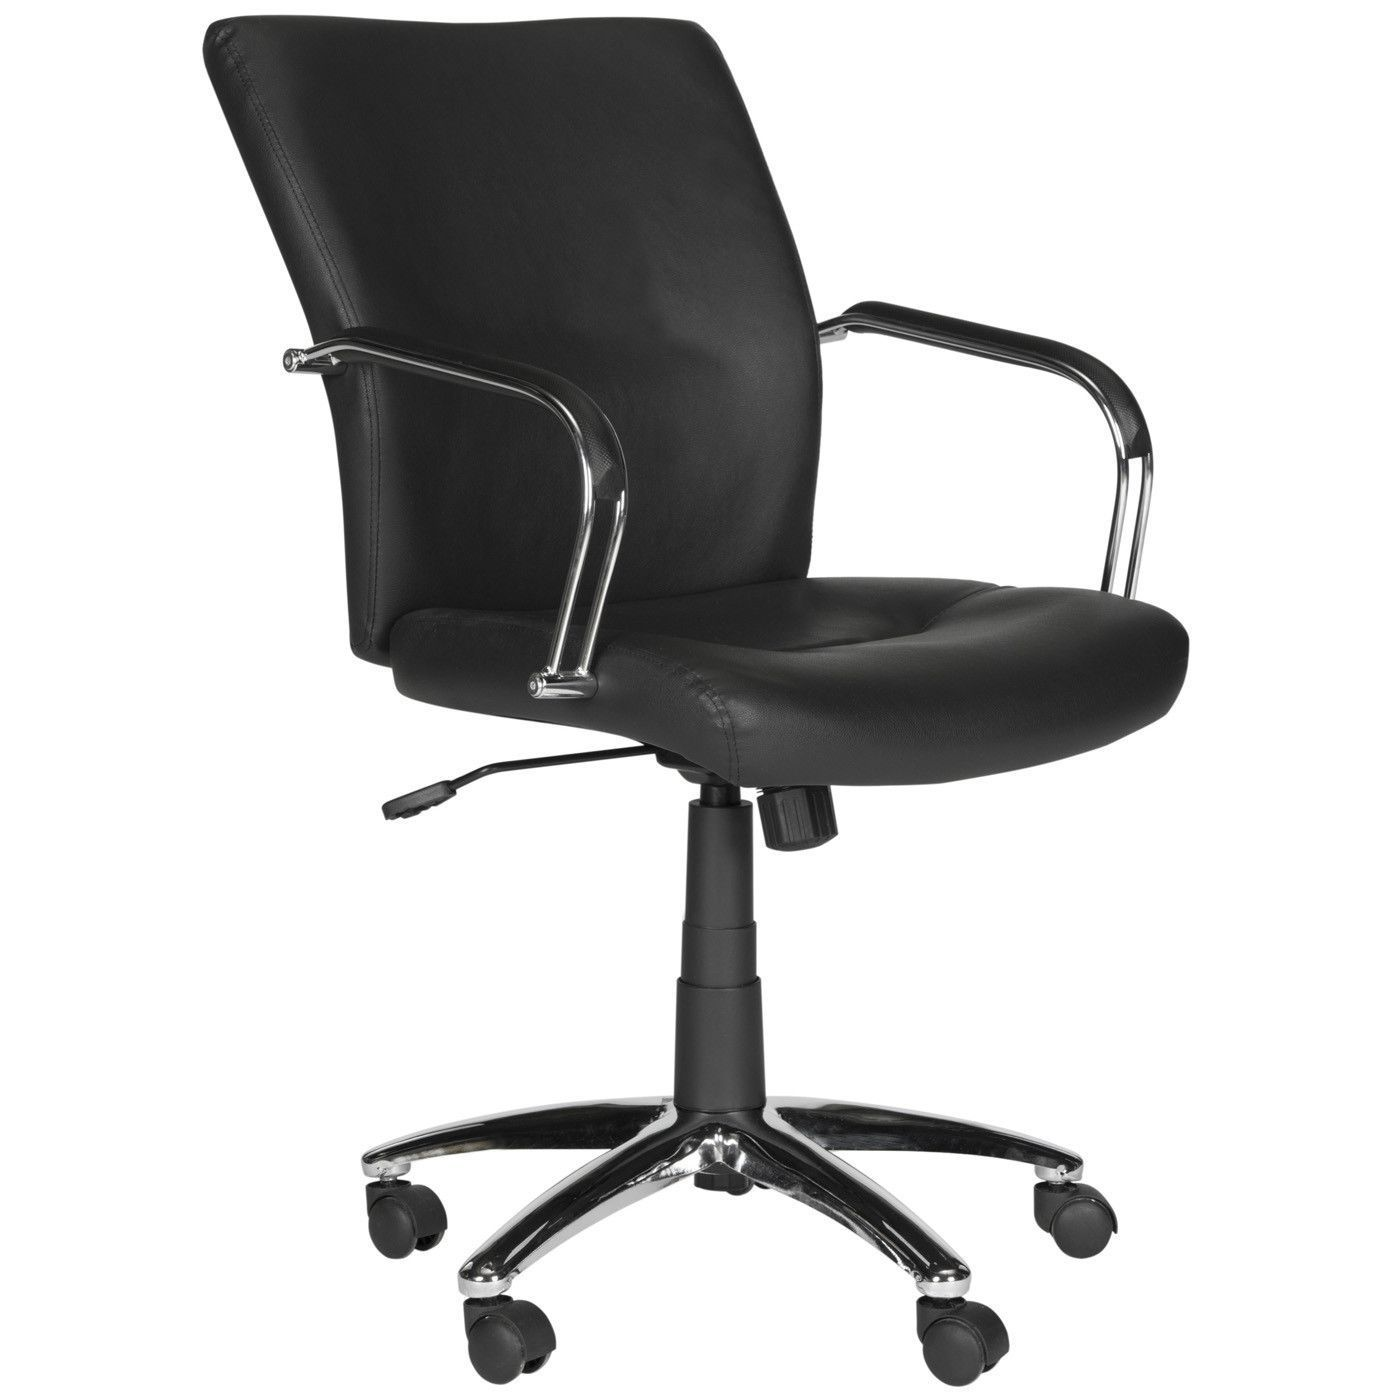 Lysette Desk Chair Black Best Office Chair Office Chair